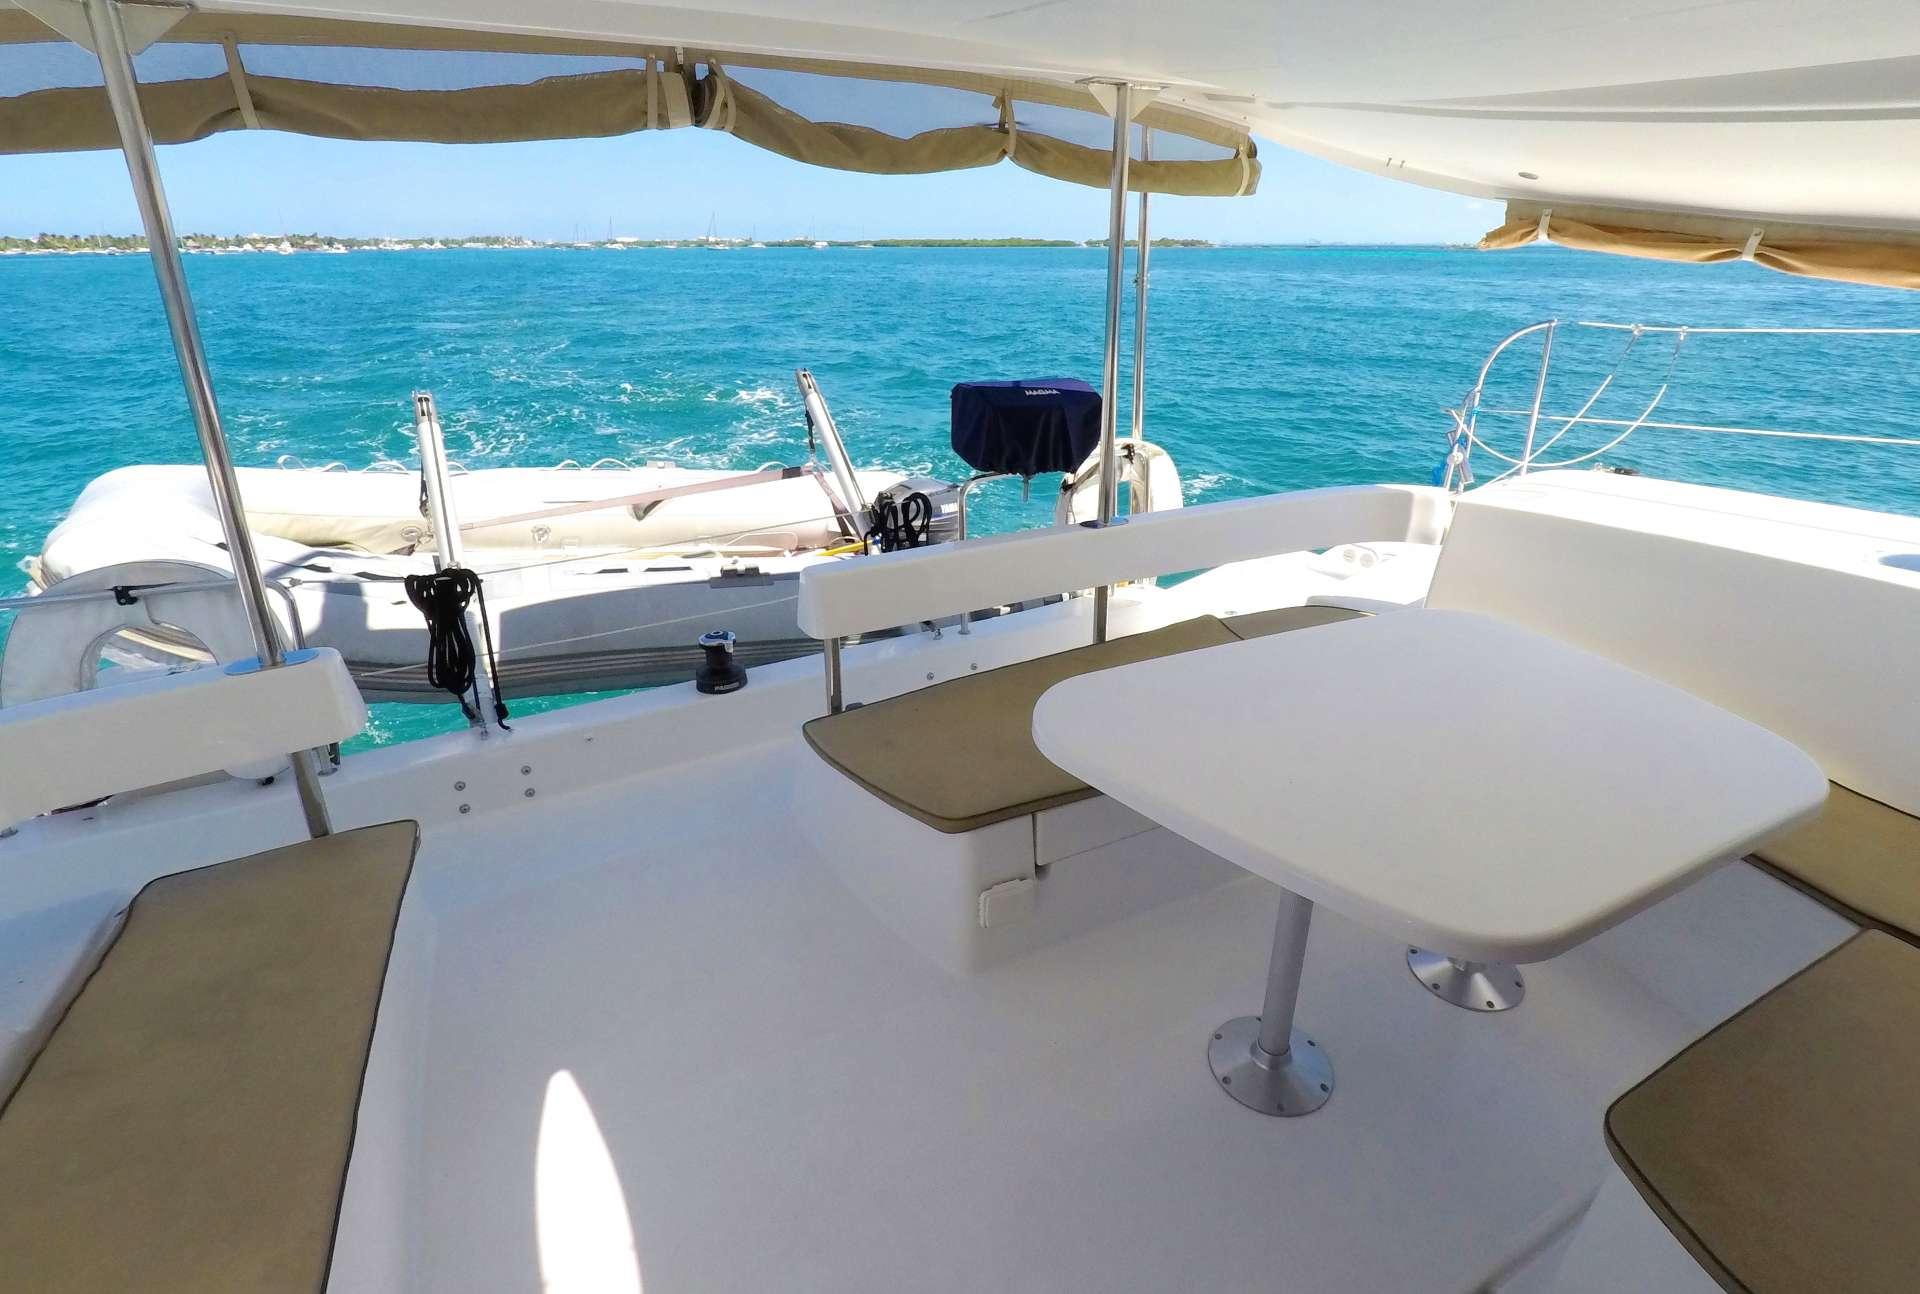 SAIL PENDING yacht image # 3